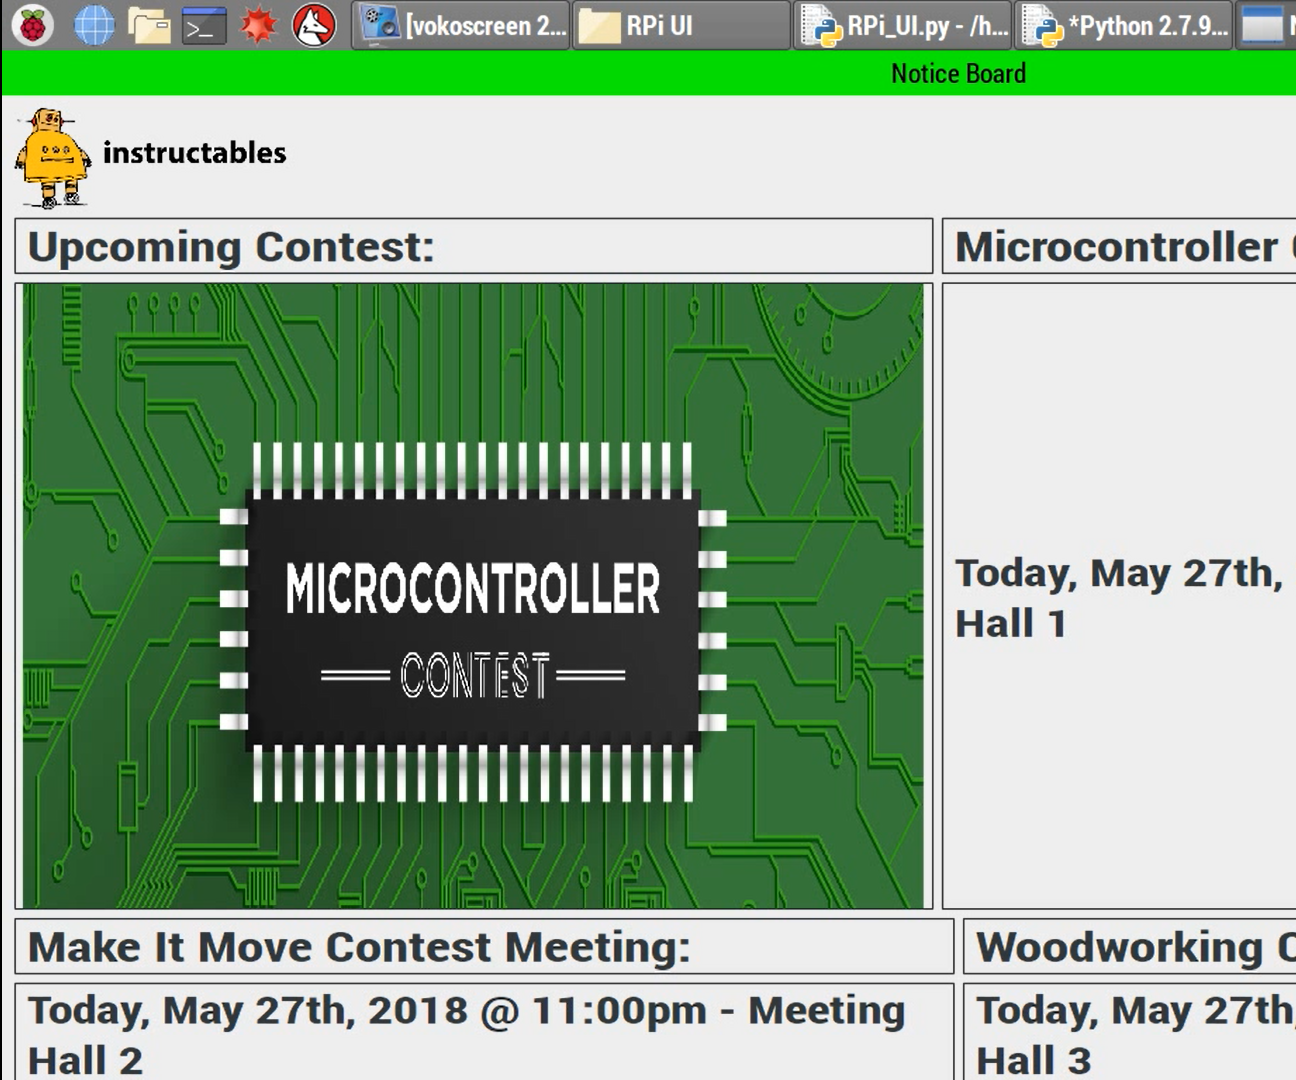 Digital Notice Board Using Raspberry Pi and MQTT Protocol: 8